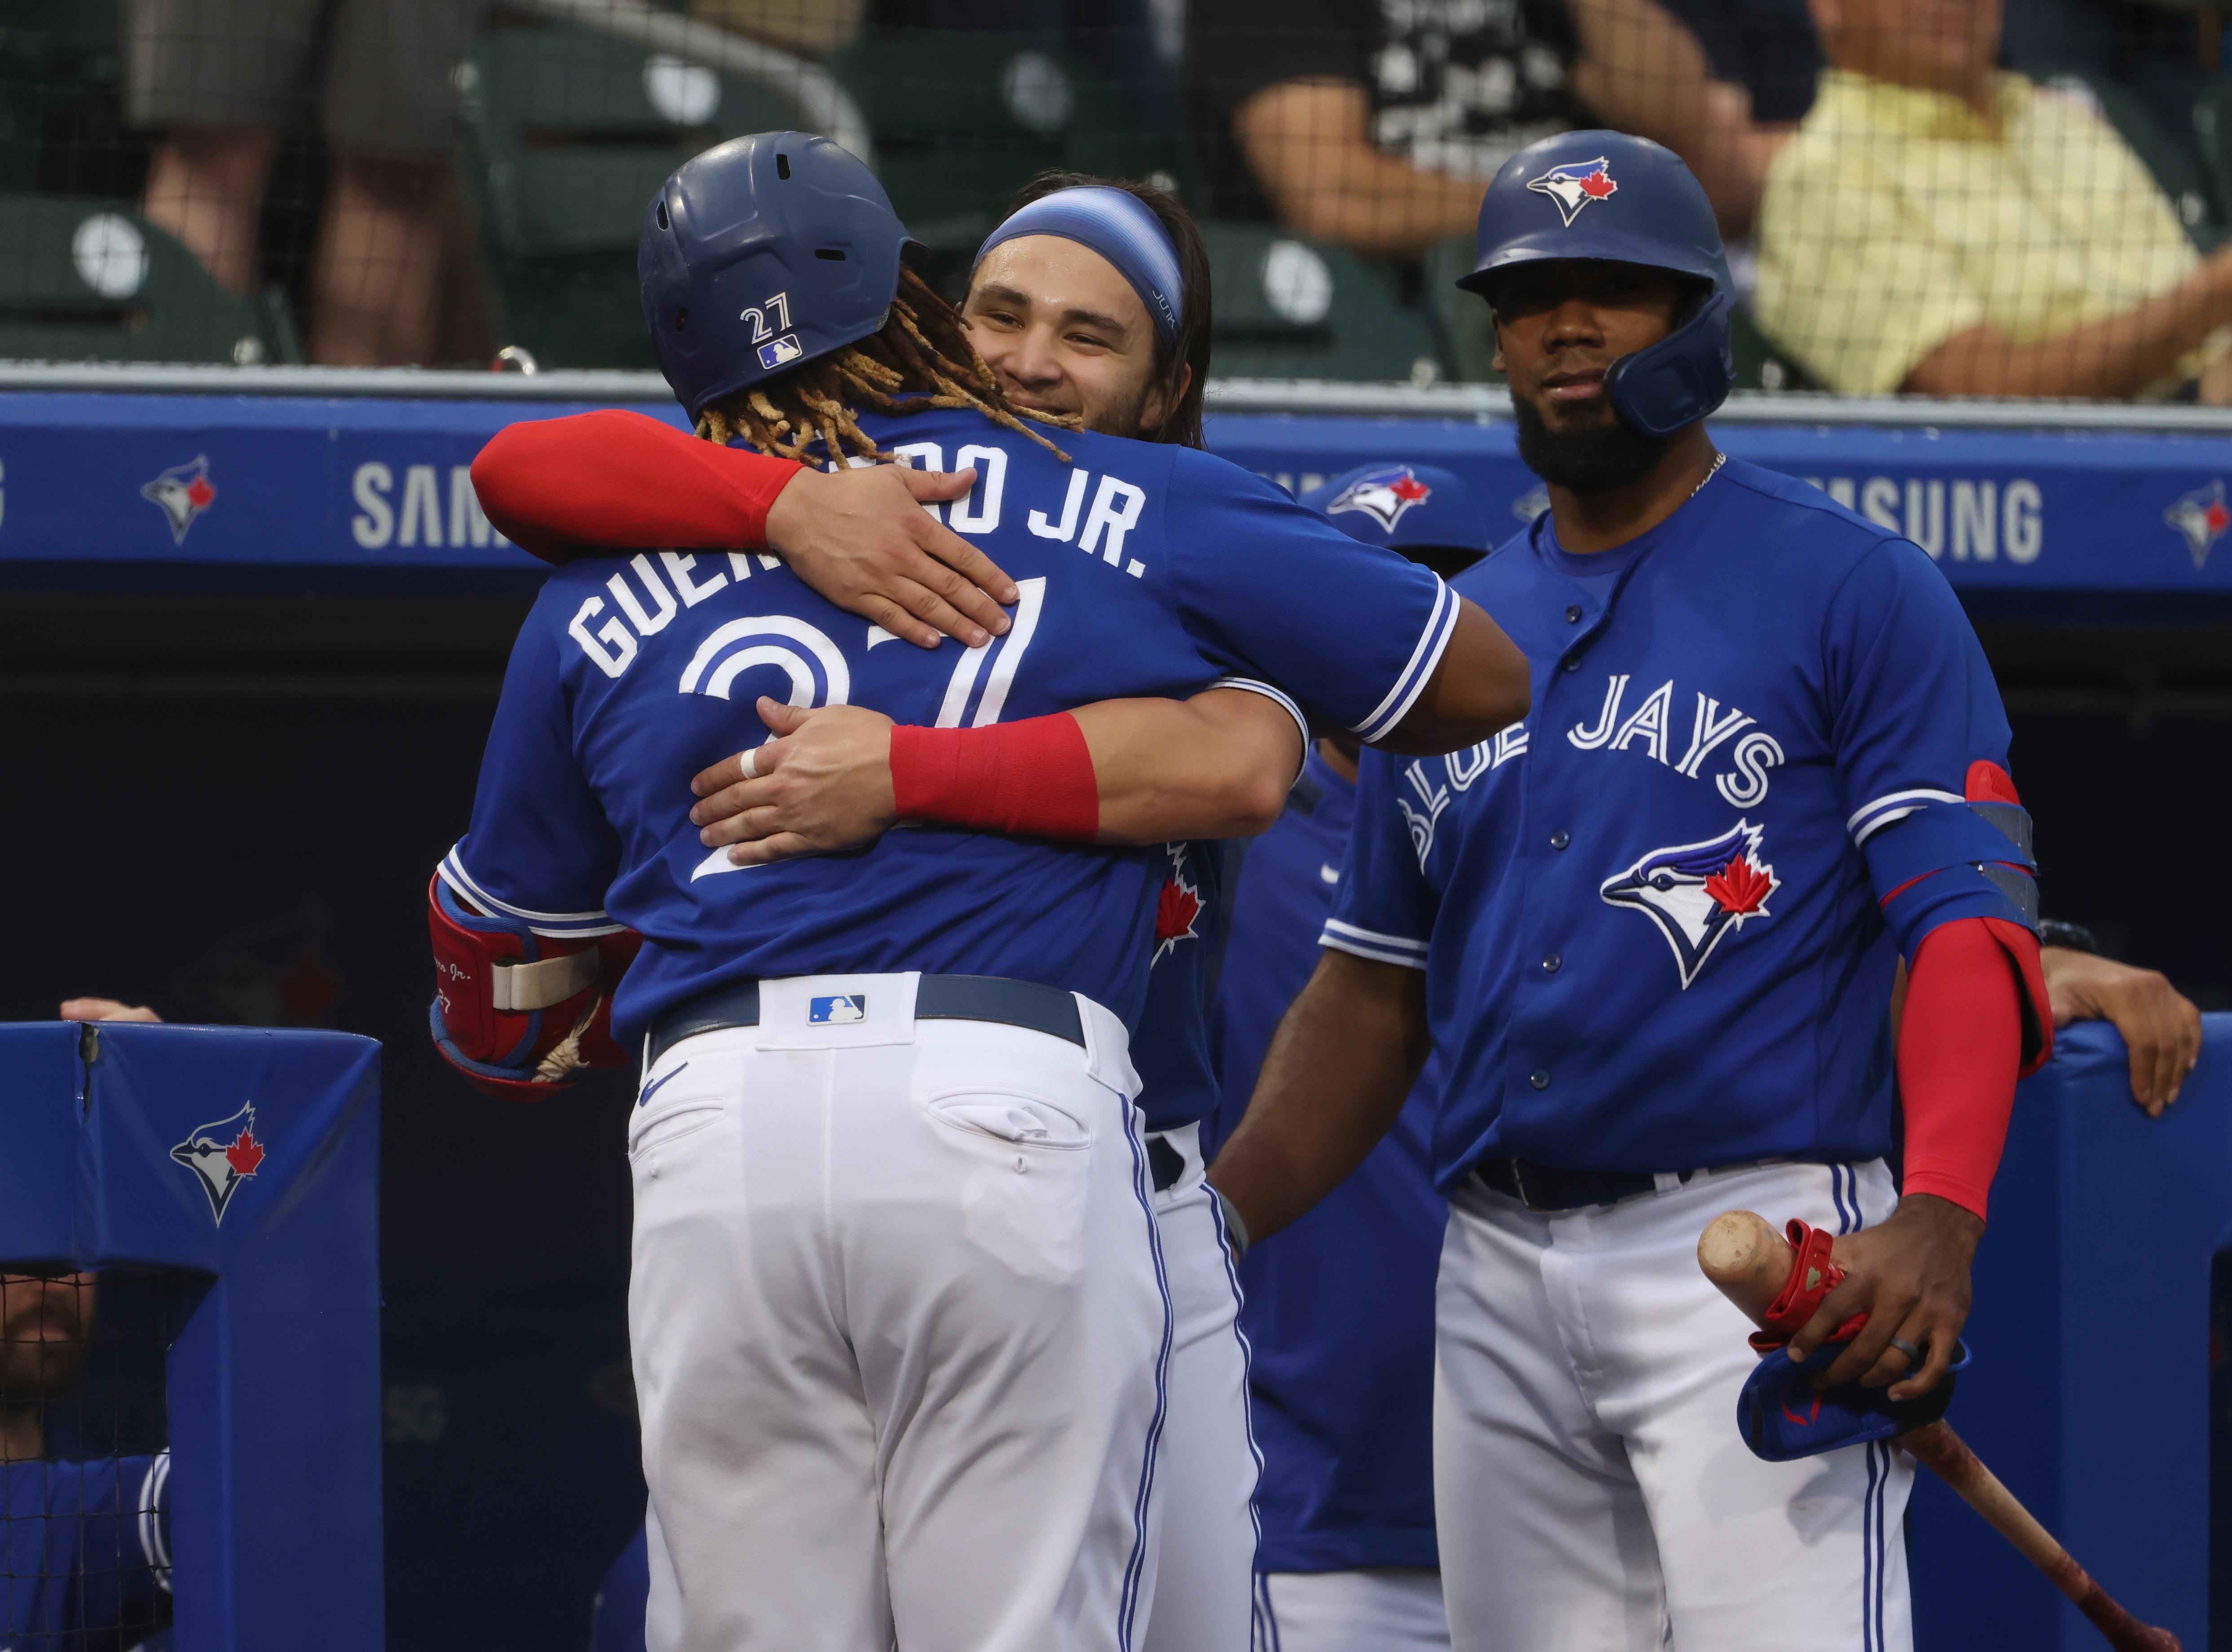 MLB: Texas Rangers at Toronto Blue Jays